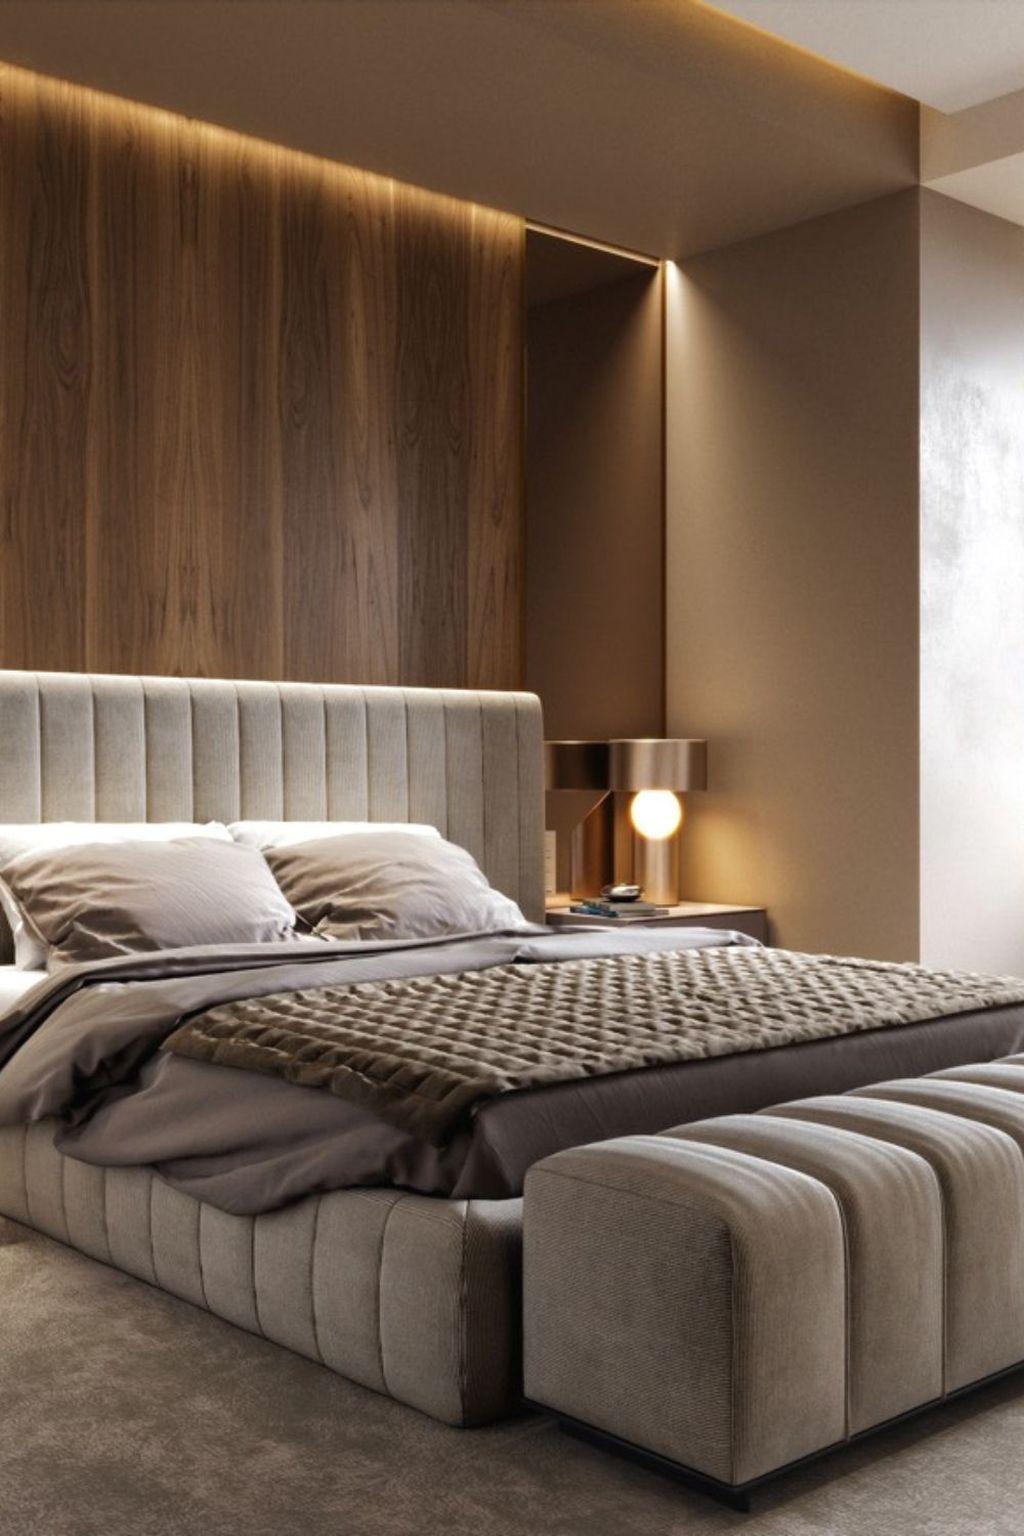 35 Recommended Luxury Bedroom Design Ideas In 2020 Luxury Bedroom Master Luxurious Bedrooms Modern Style Bedroom